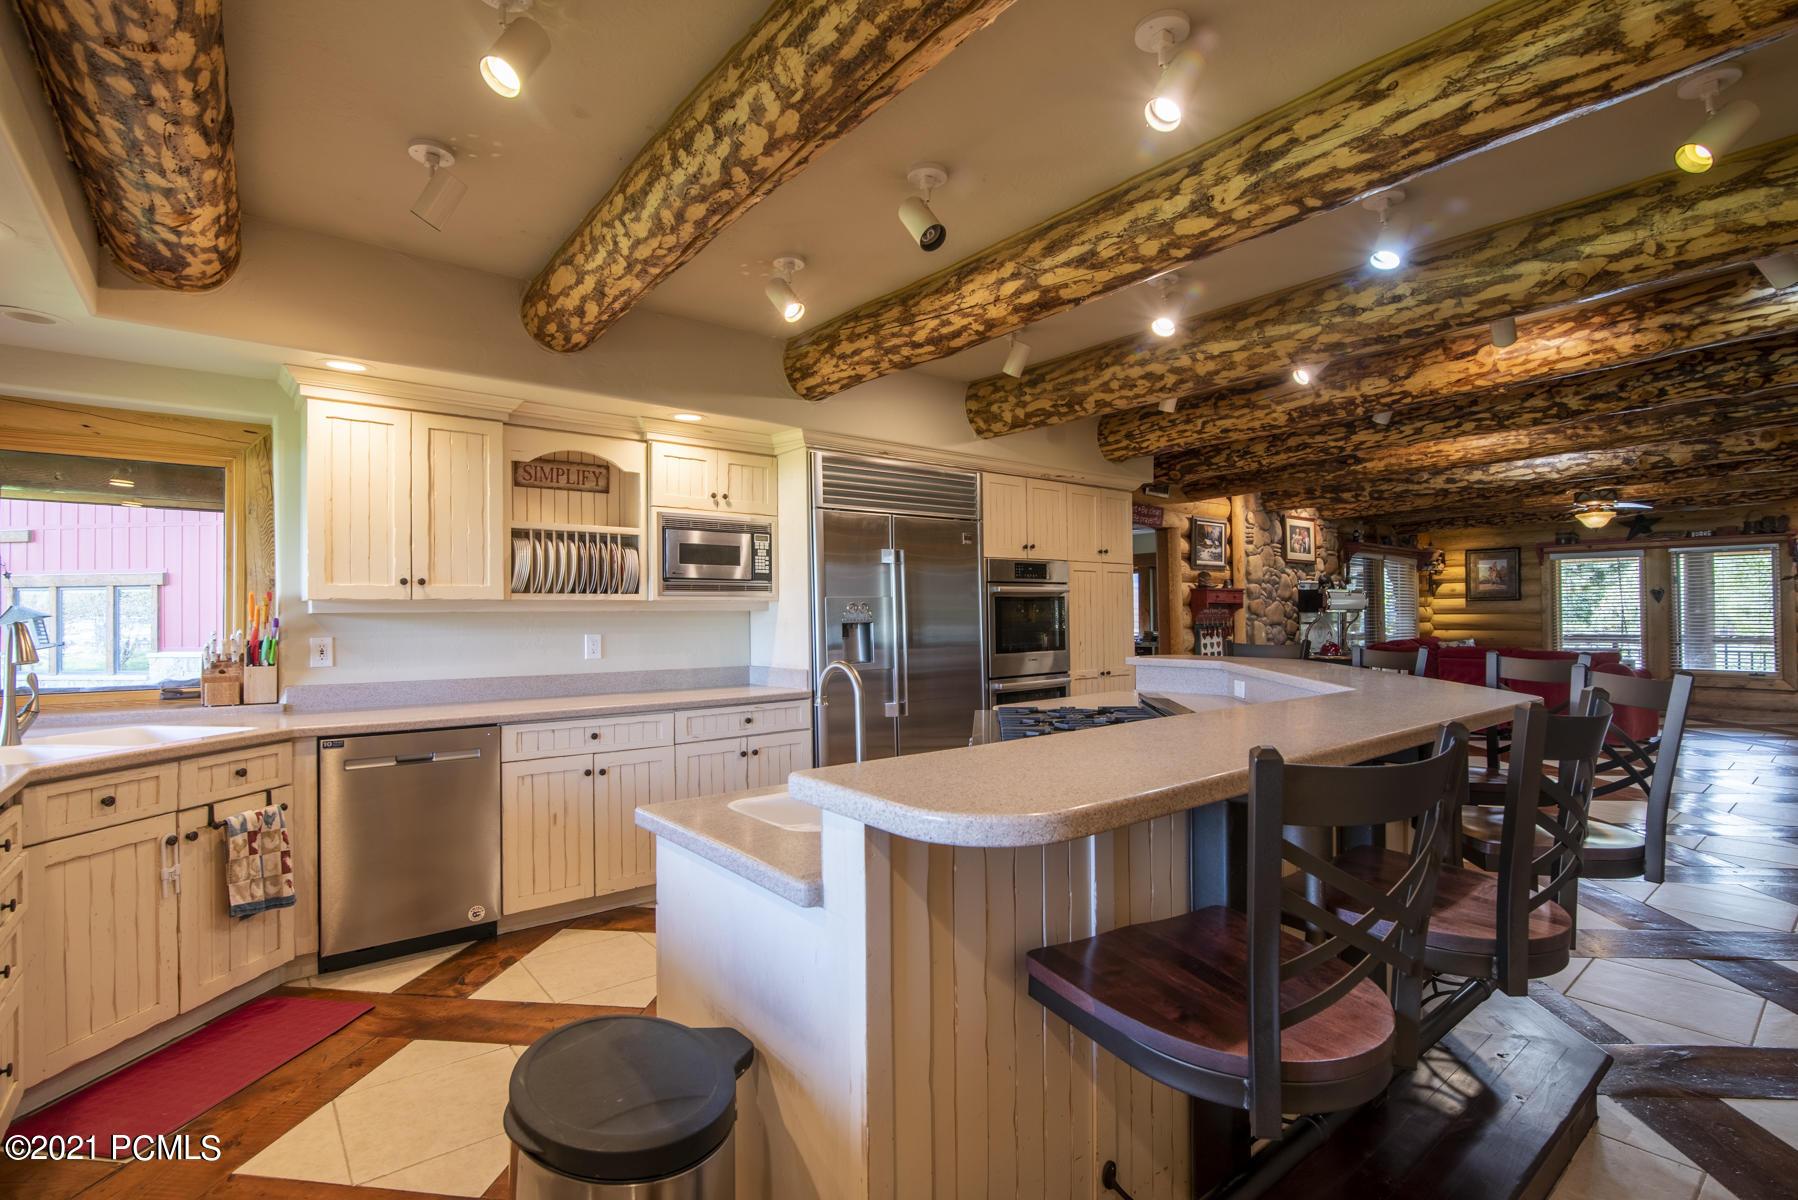 2188 Creekside Drive, Heber City, Utah 84032, 9 Bedrooms Bedrooms, ,8 BathroomsBathrooms,Single Family,For Sale,Creekside,12101935